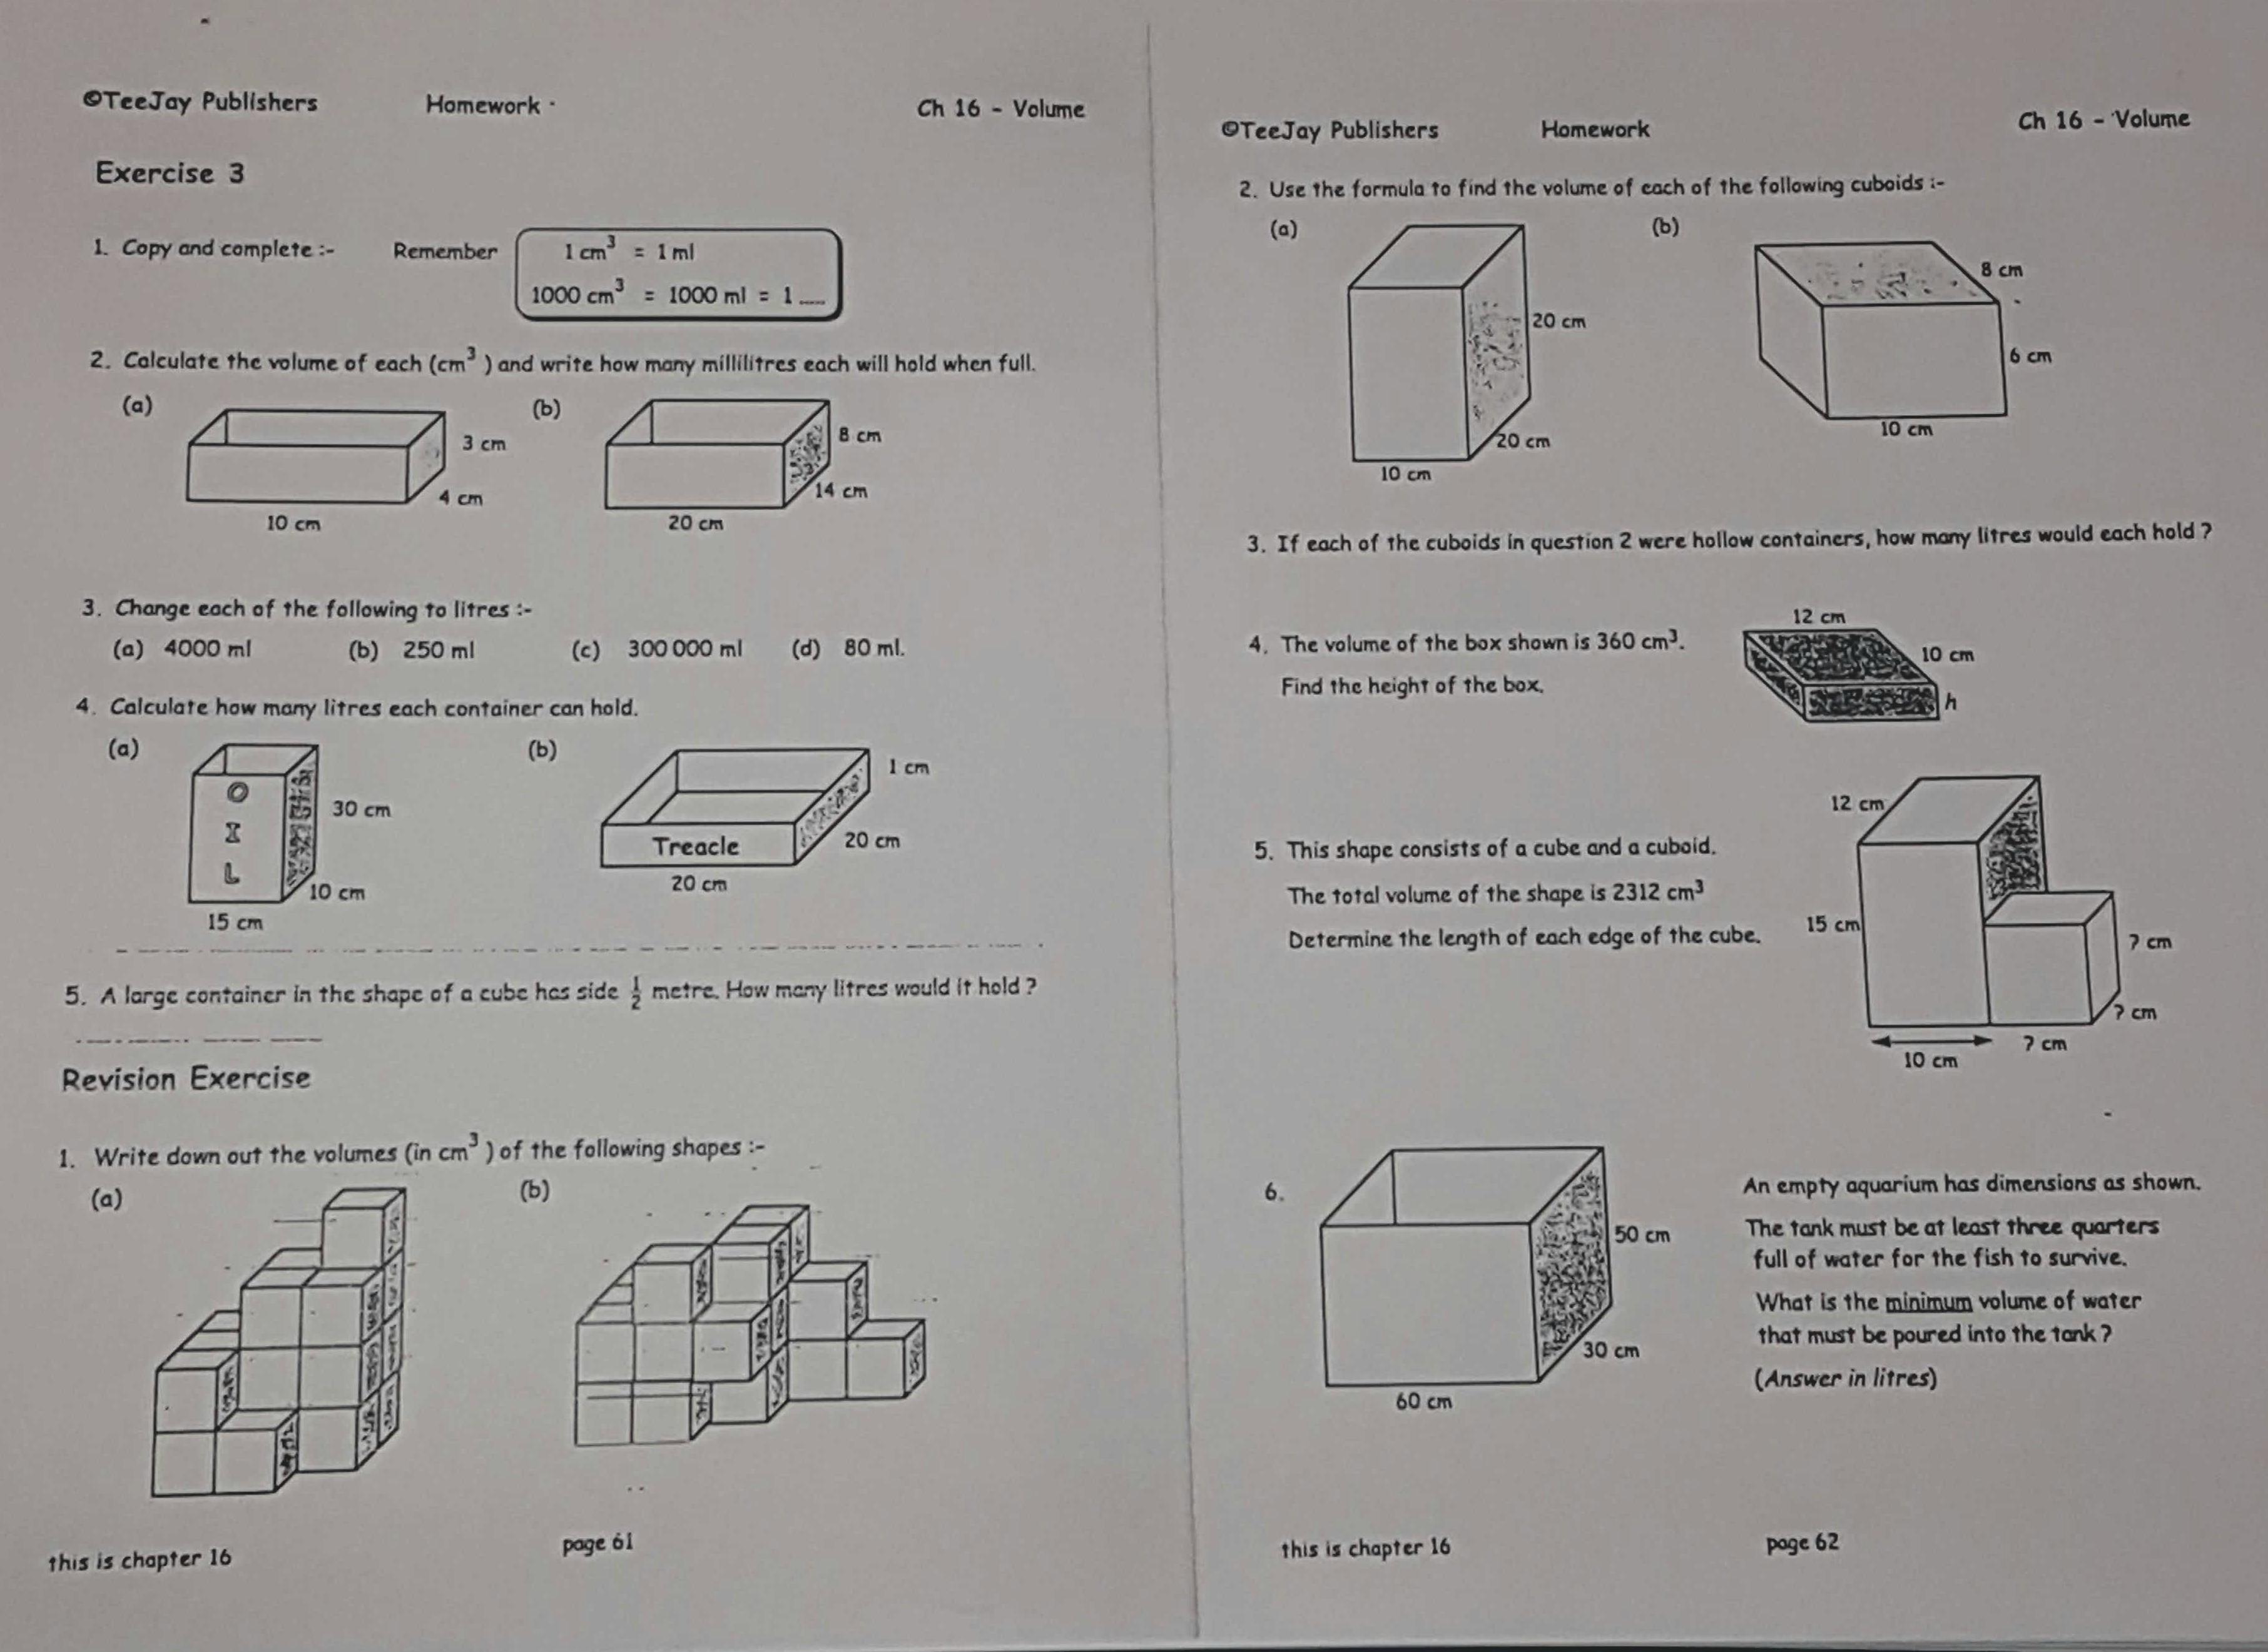 Loanhead Primary School P7 News And Homework 25 9 17 [ 2641 x 3625 Pixel ]